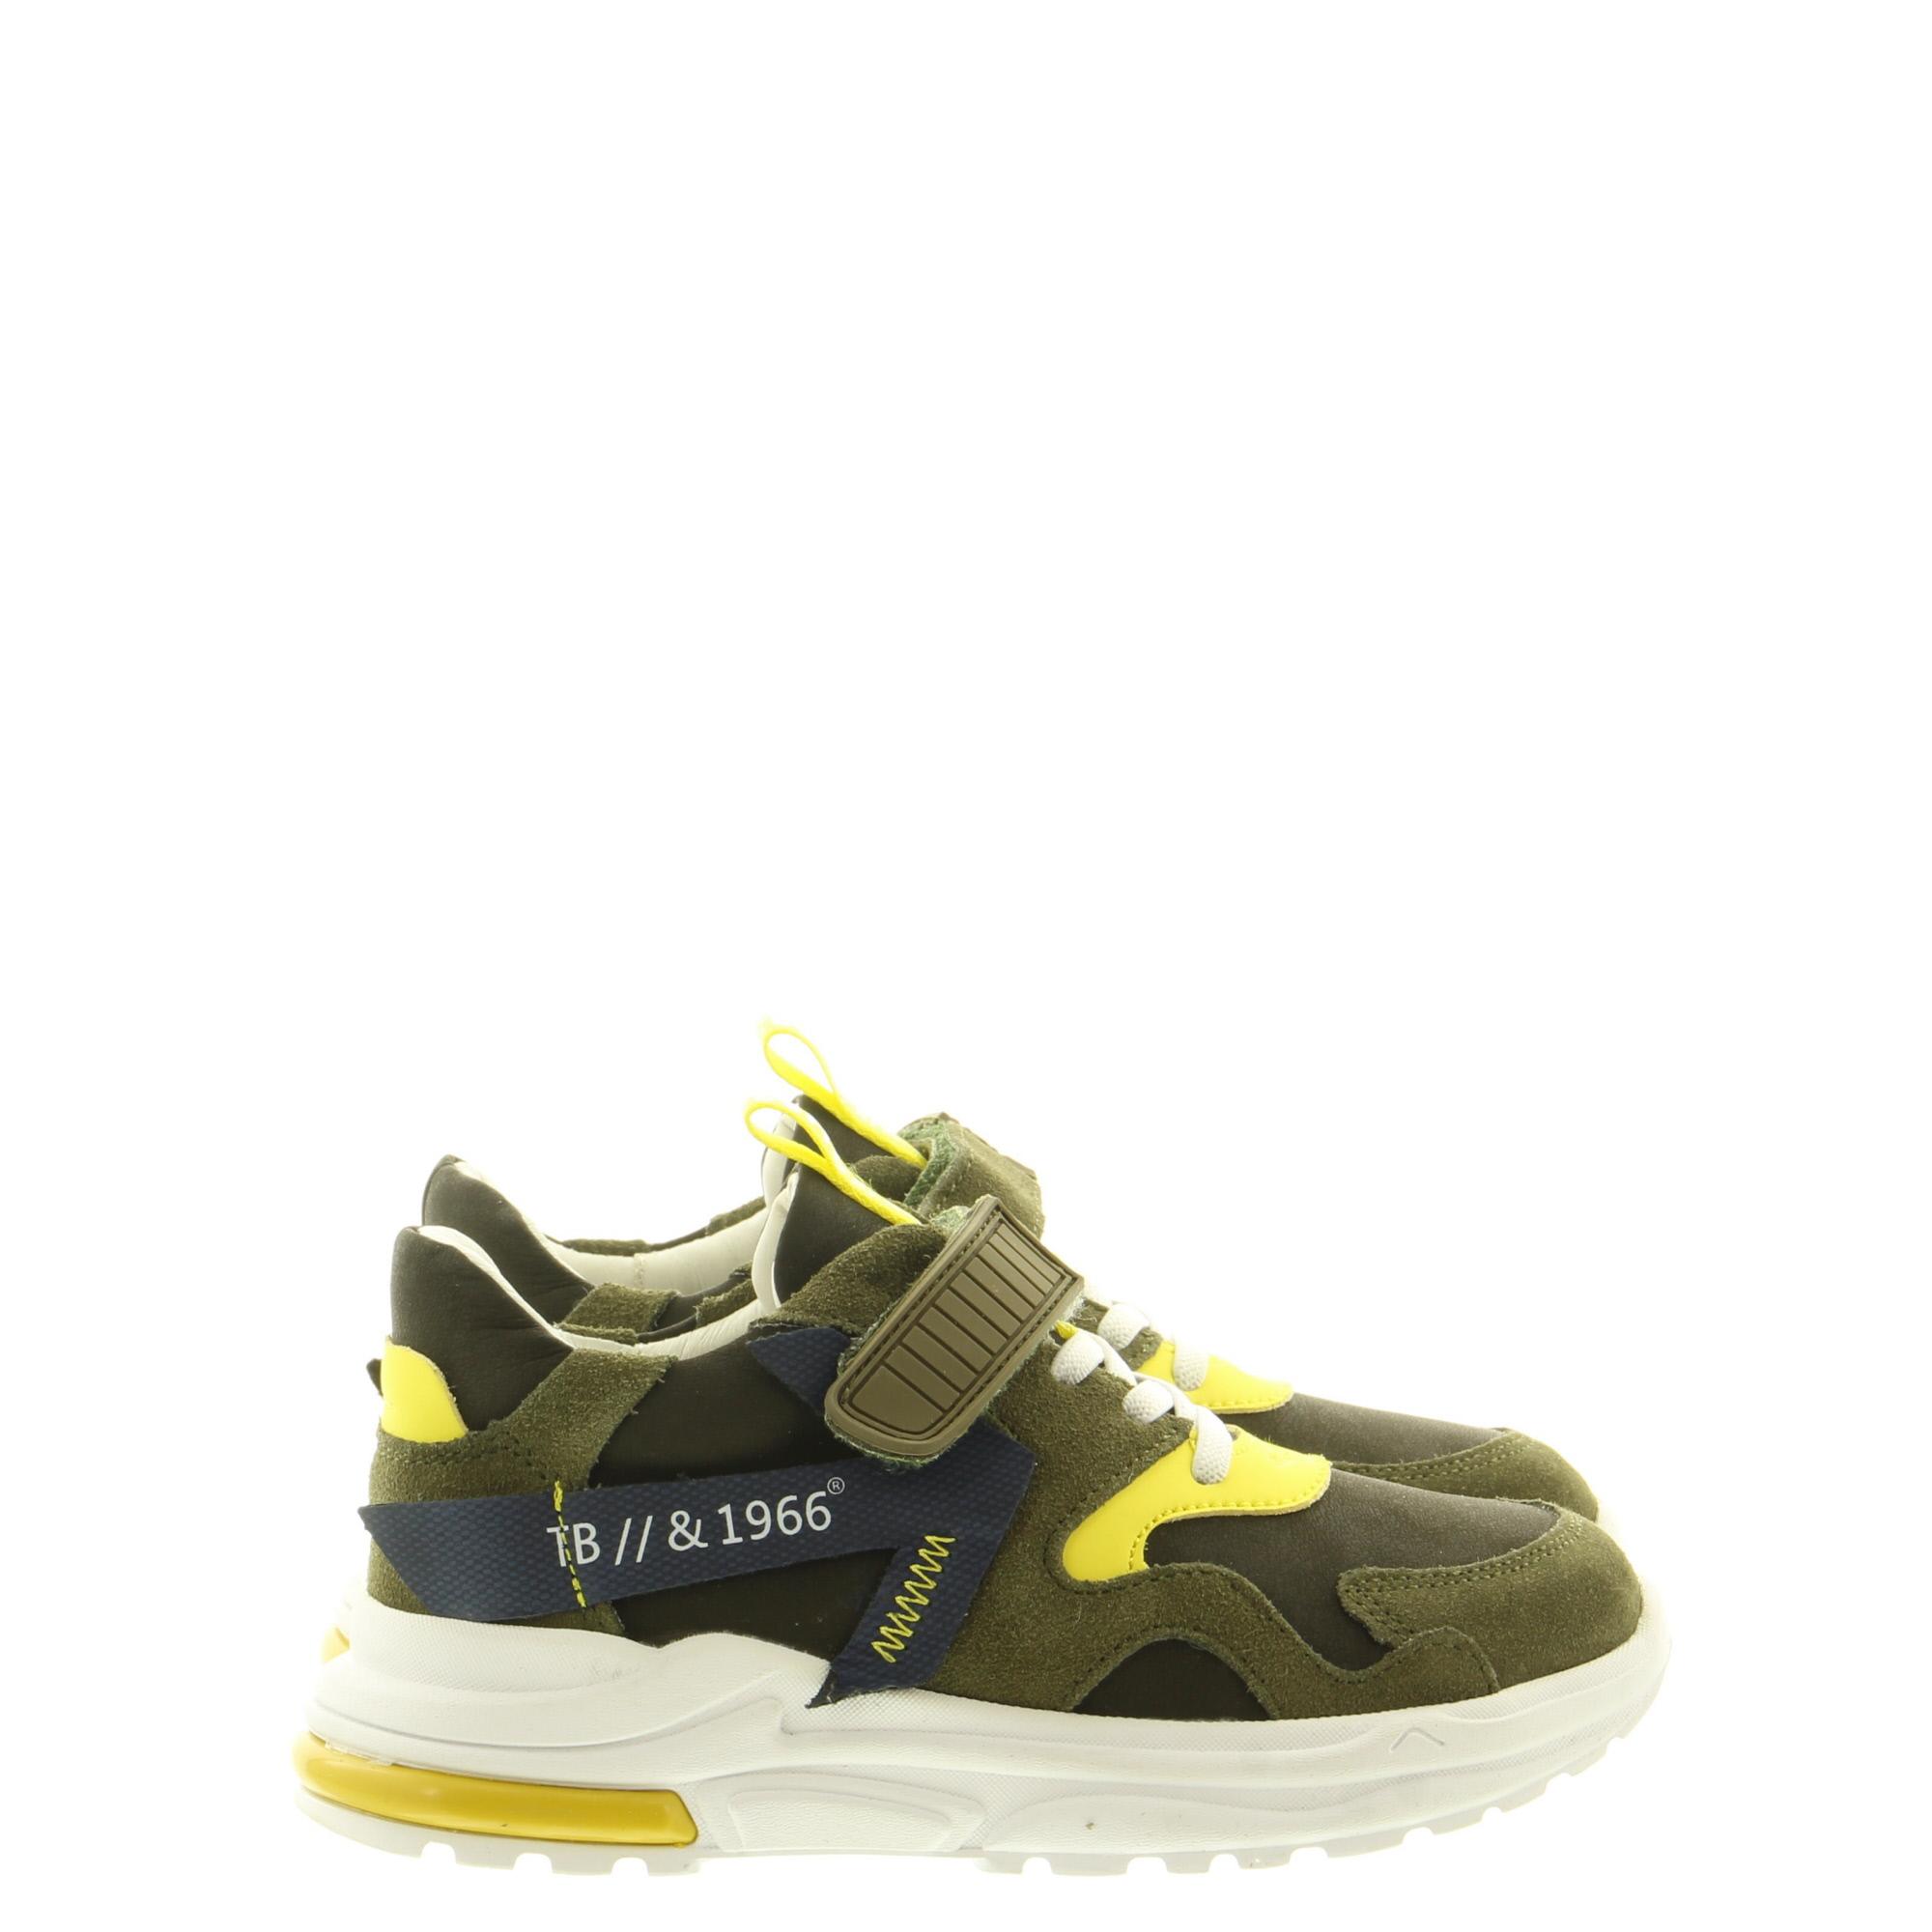 ShoesMe NR21S001-C Green Yellow